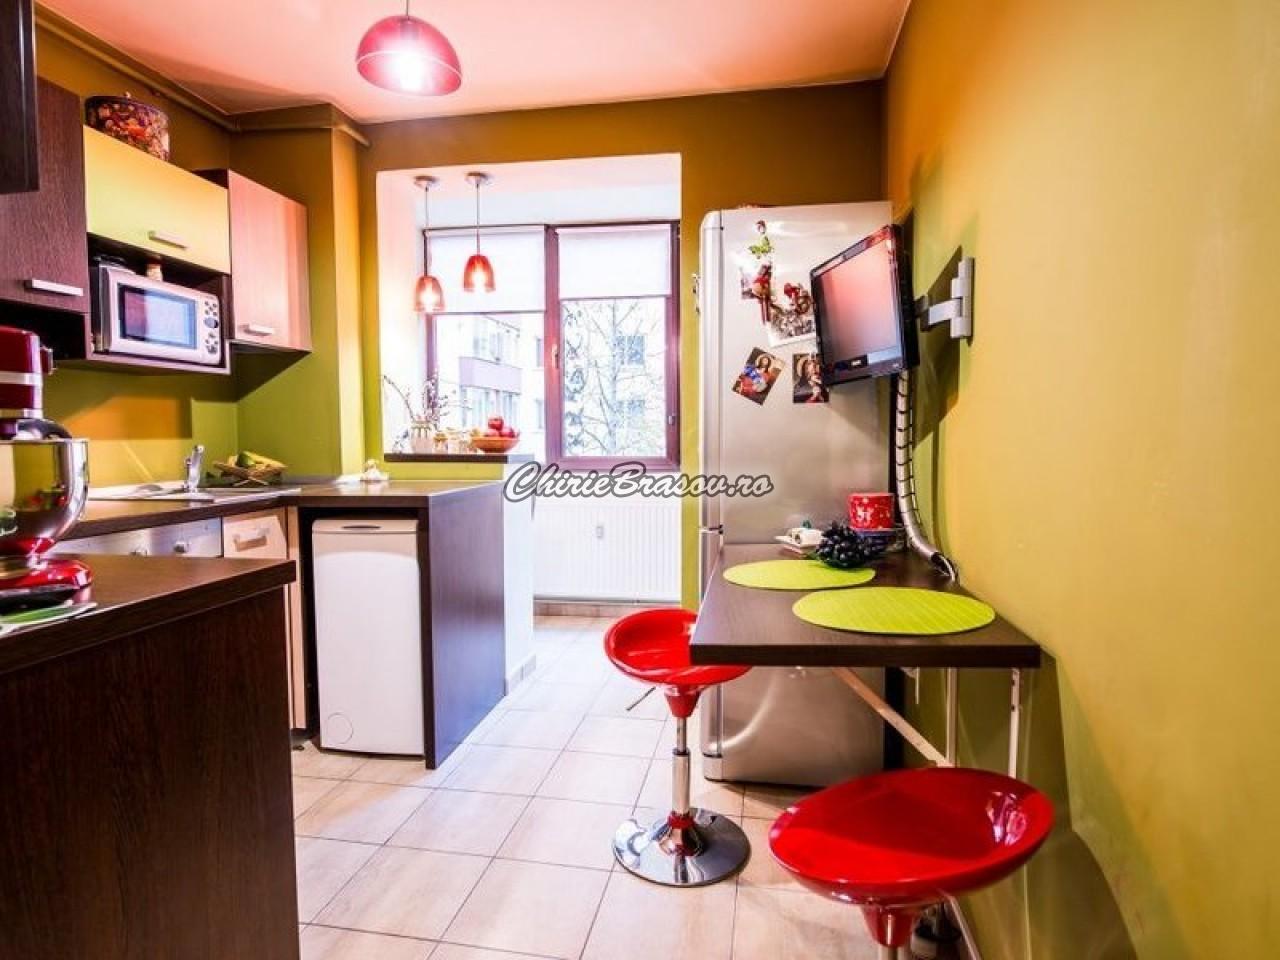 Inchiriere apartament 2 camere Brasov , Central - Grivitei-353-11